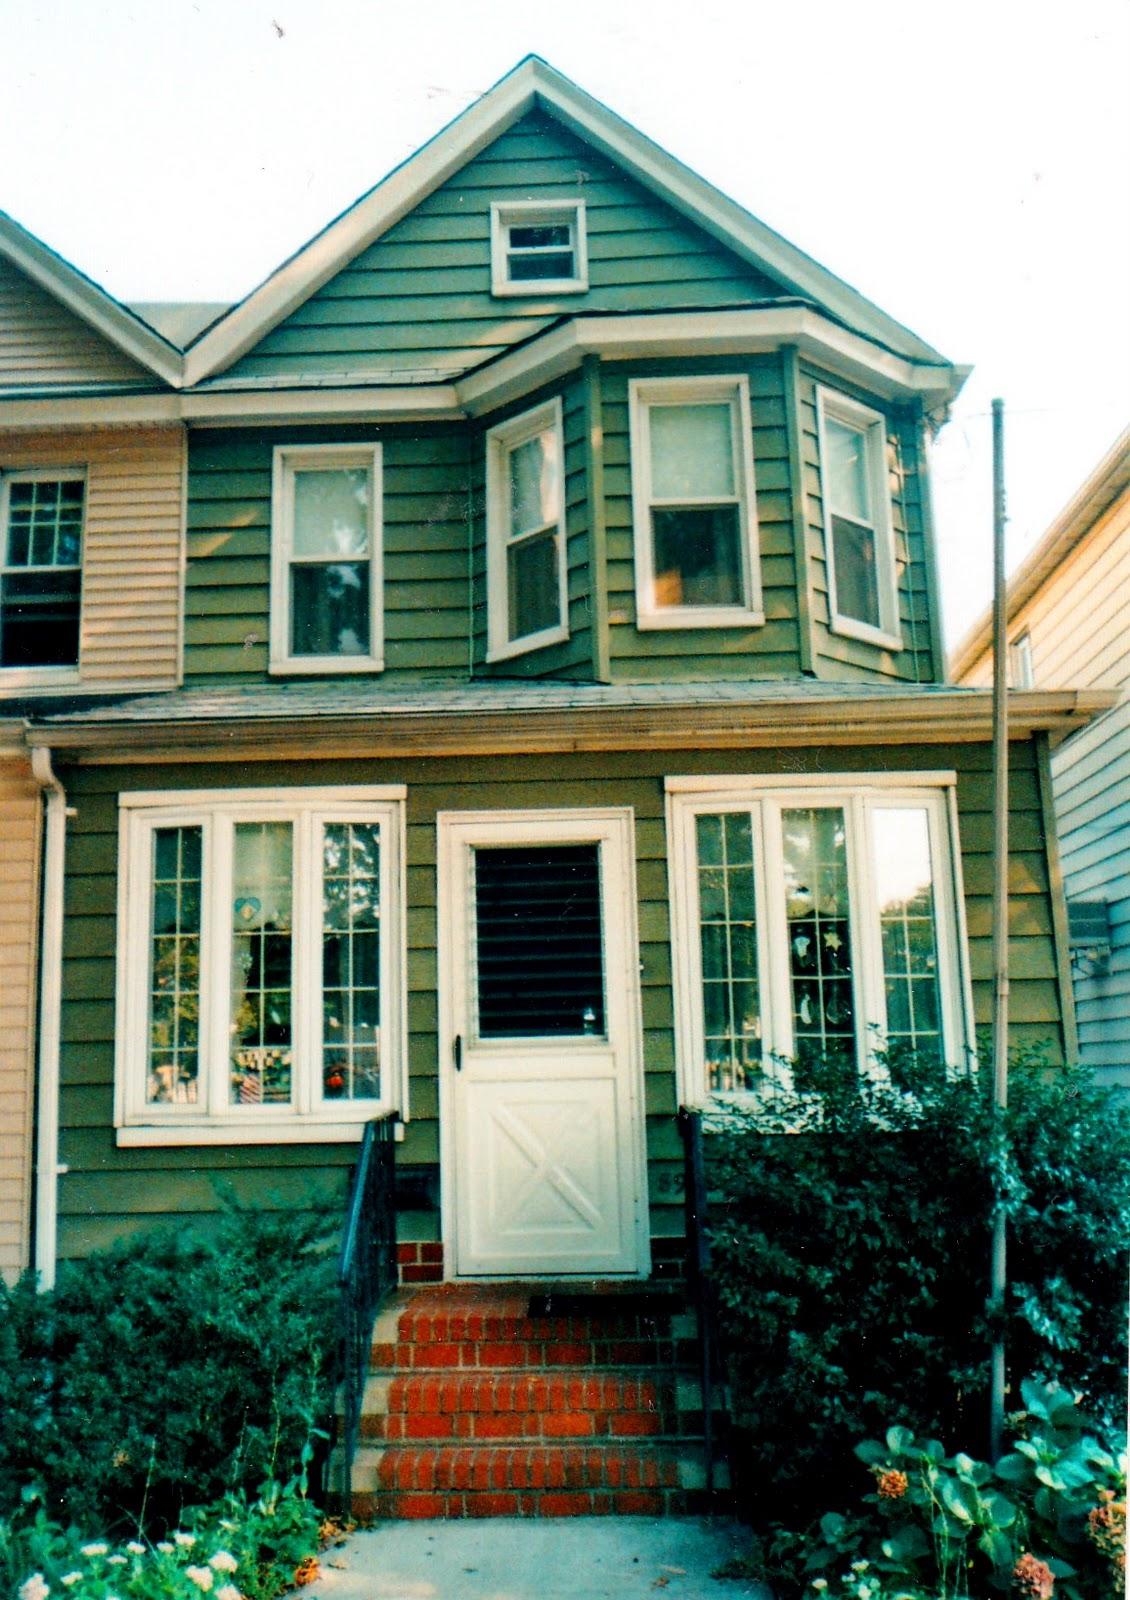 David cobb craig three humble historic houses - Houses plans ...